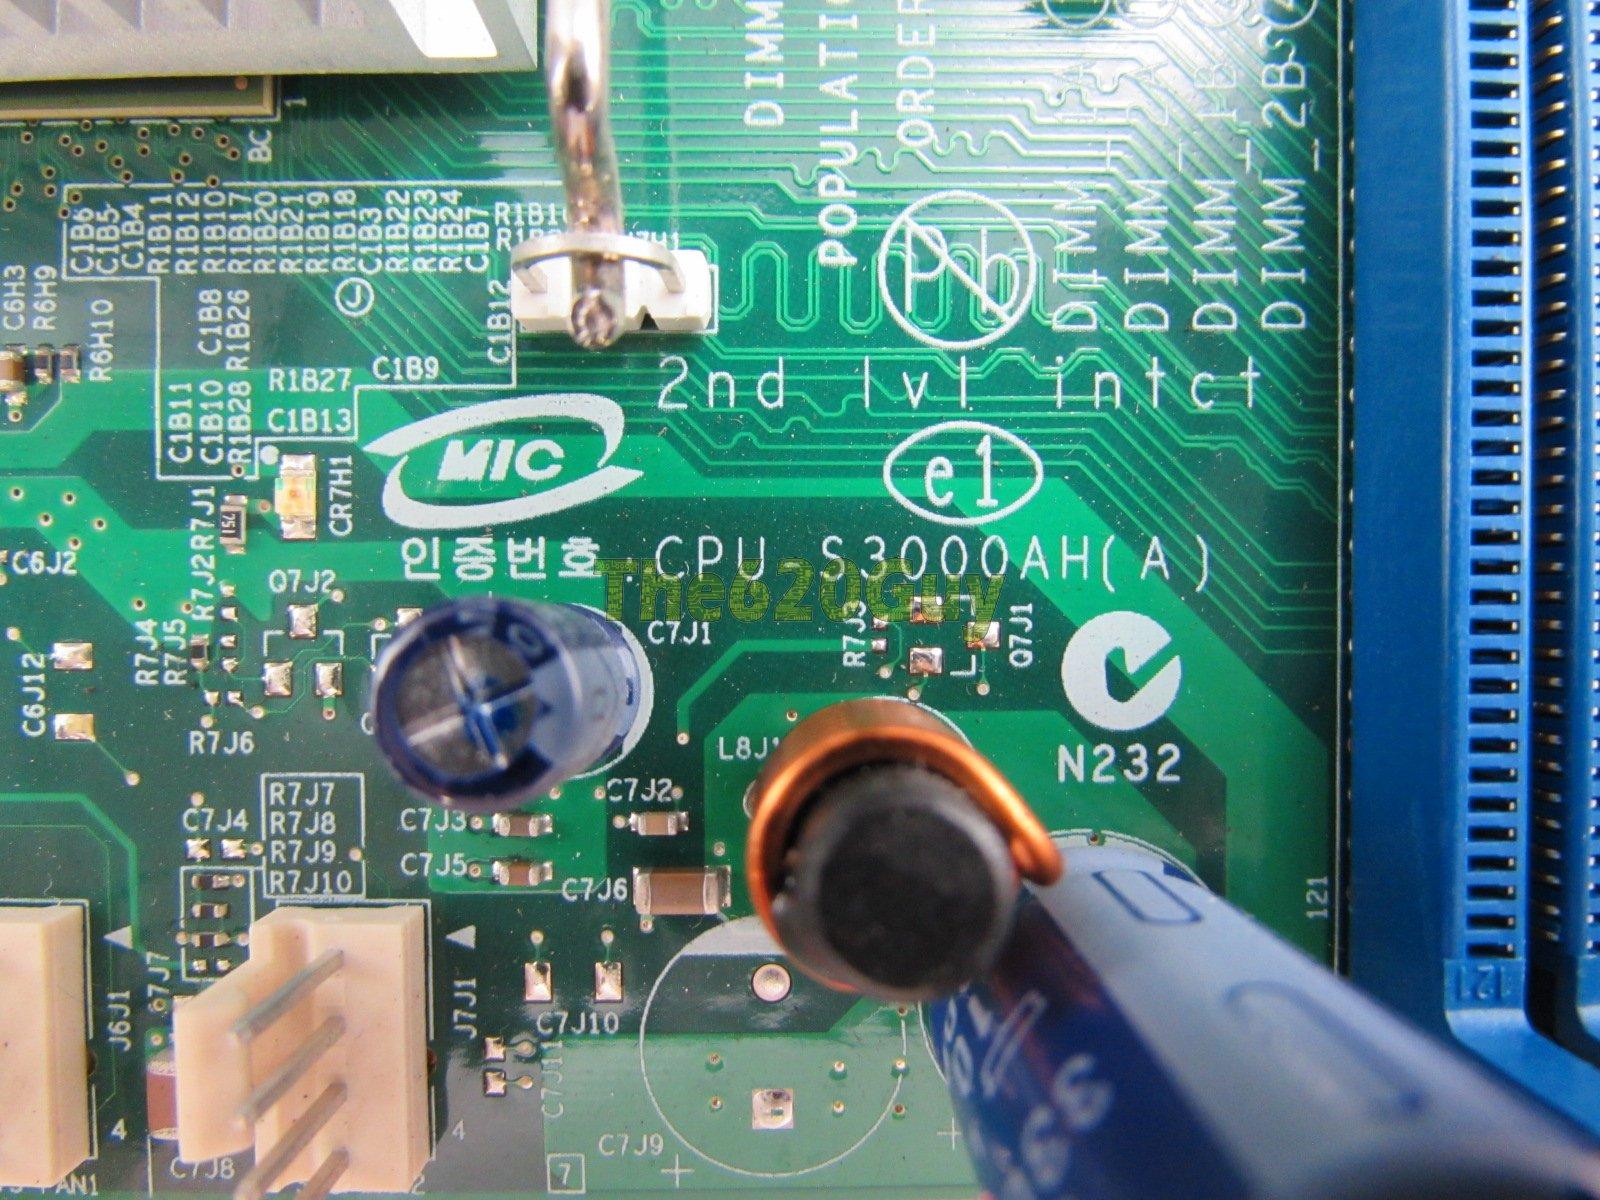 Intel Server Board S3000ah Driver Download